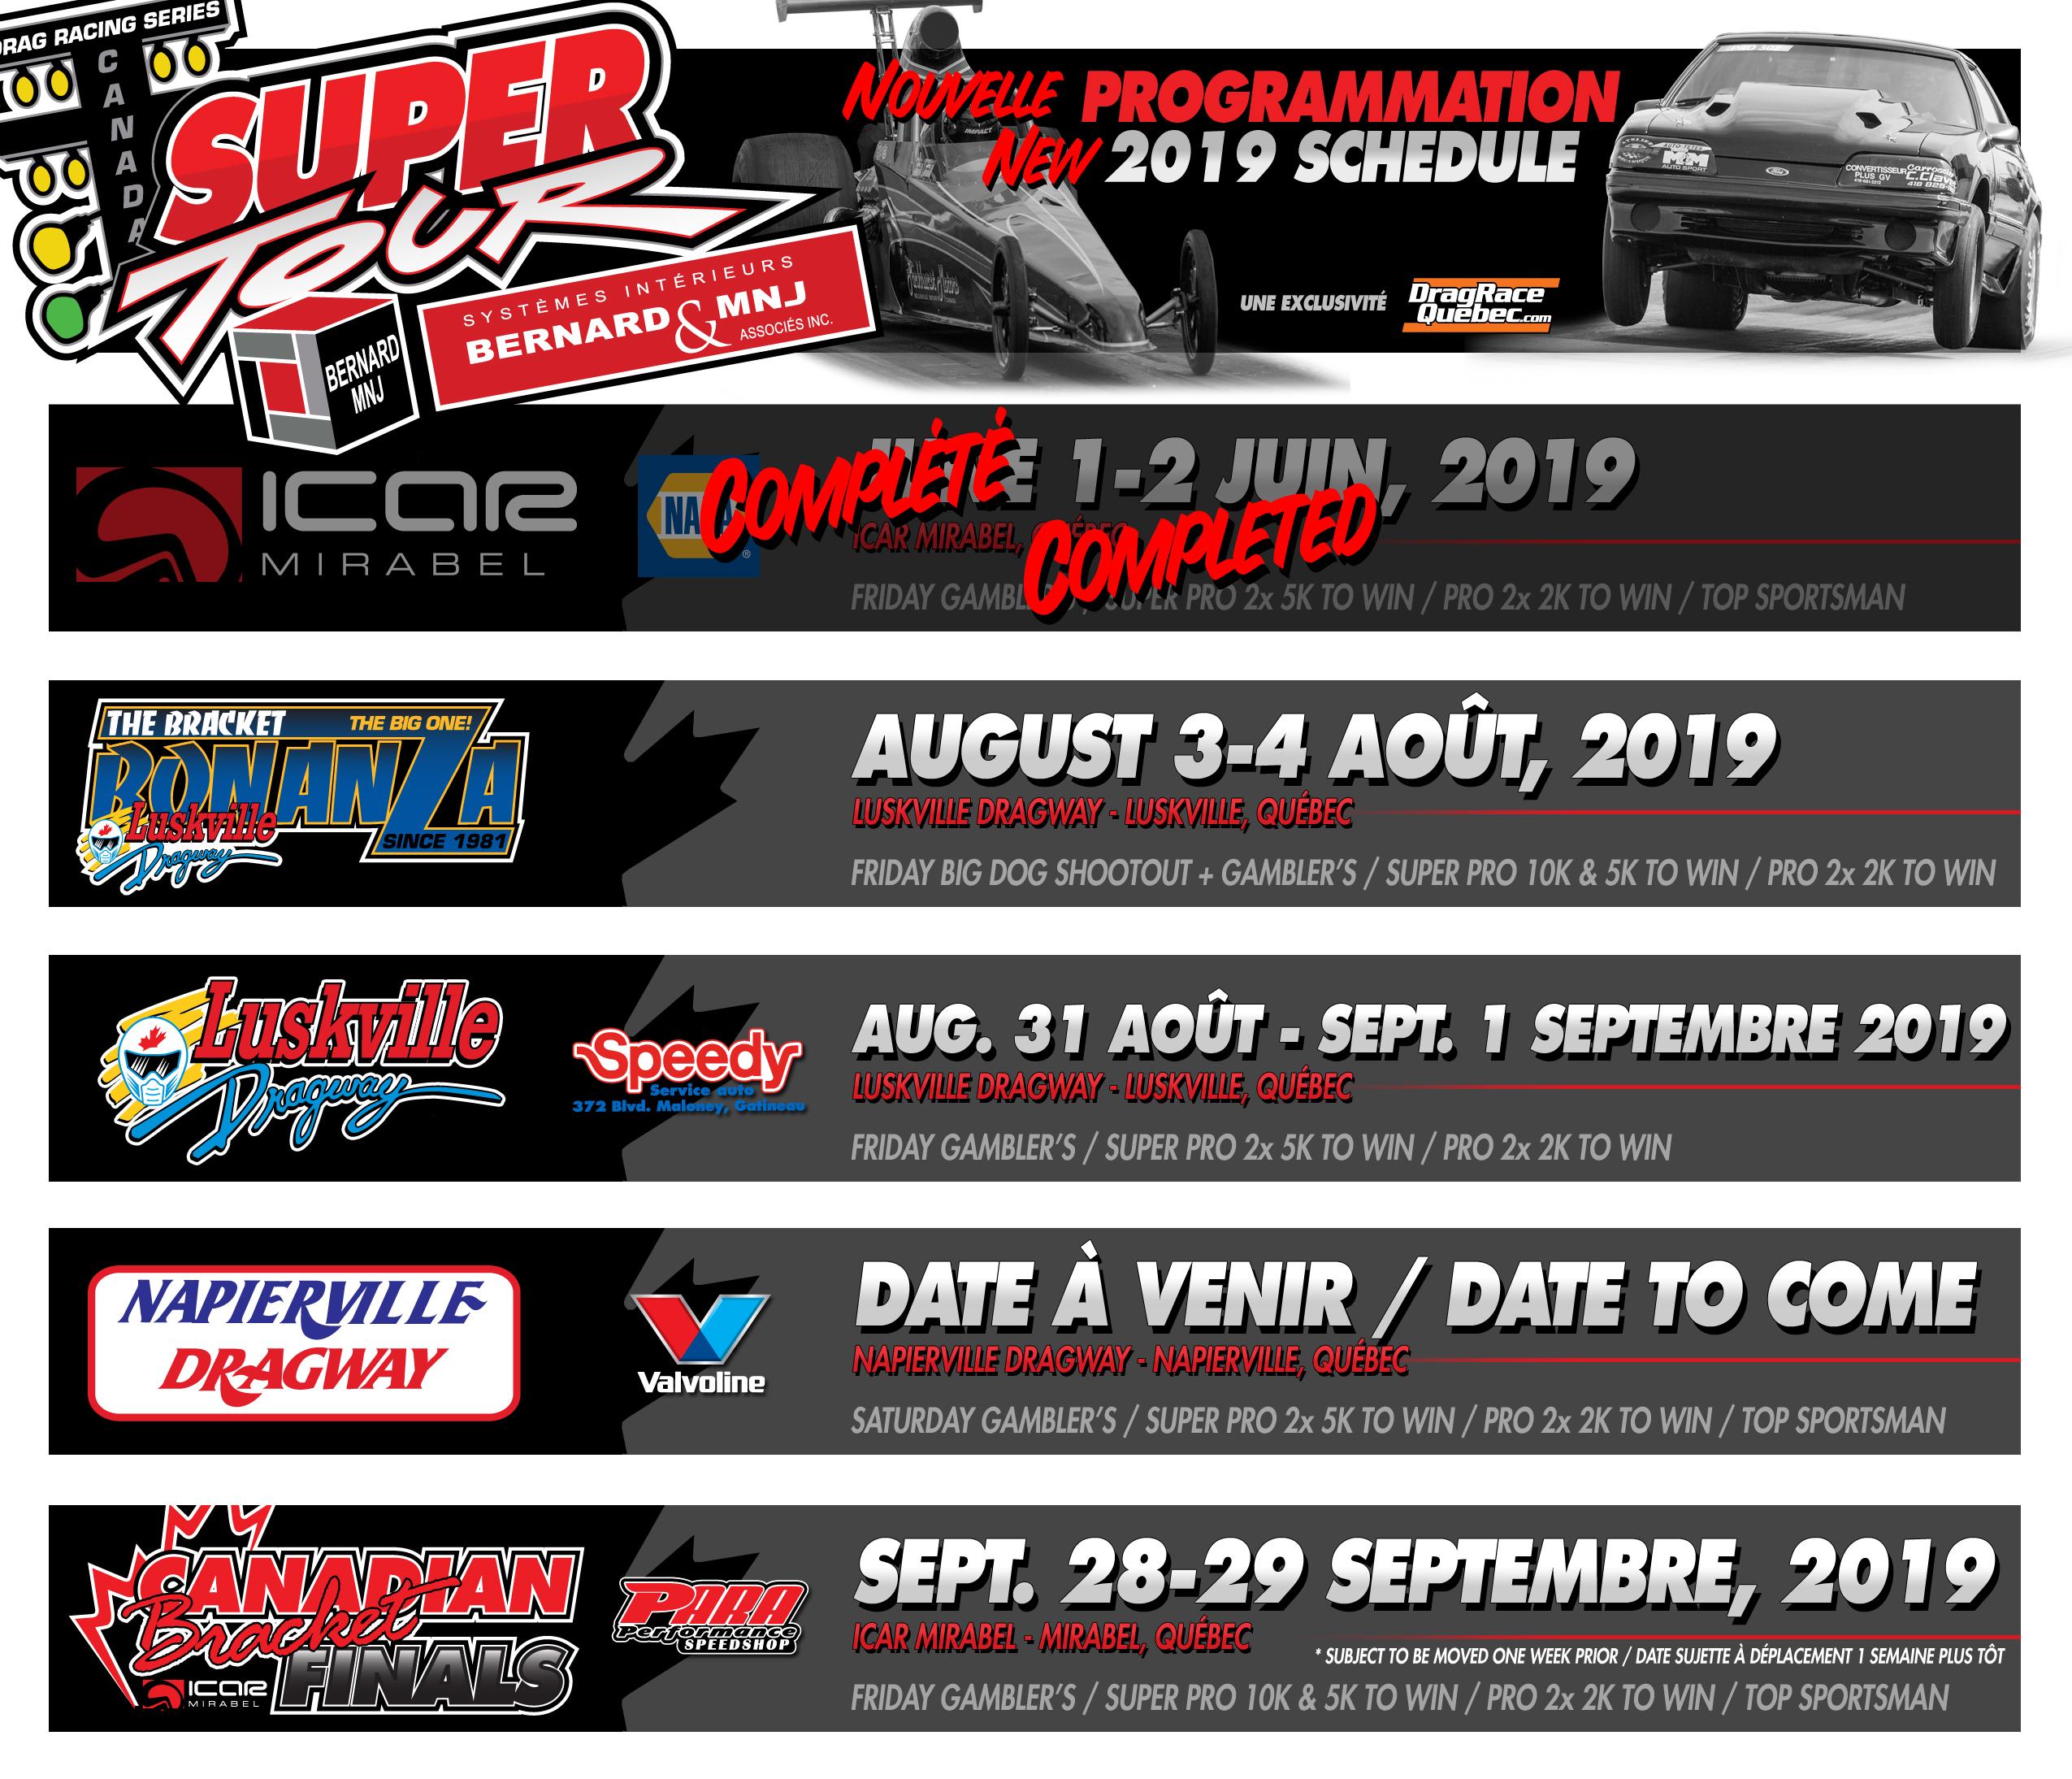 2019-06-13-new-schedule